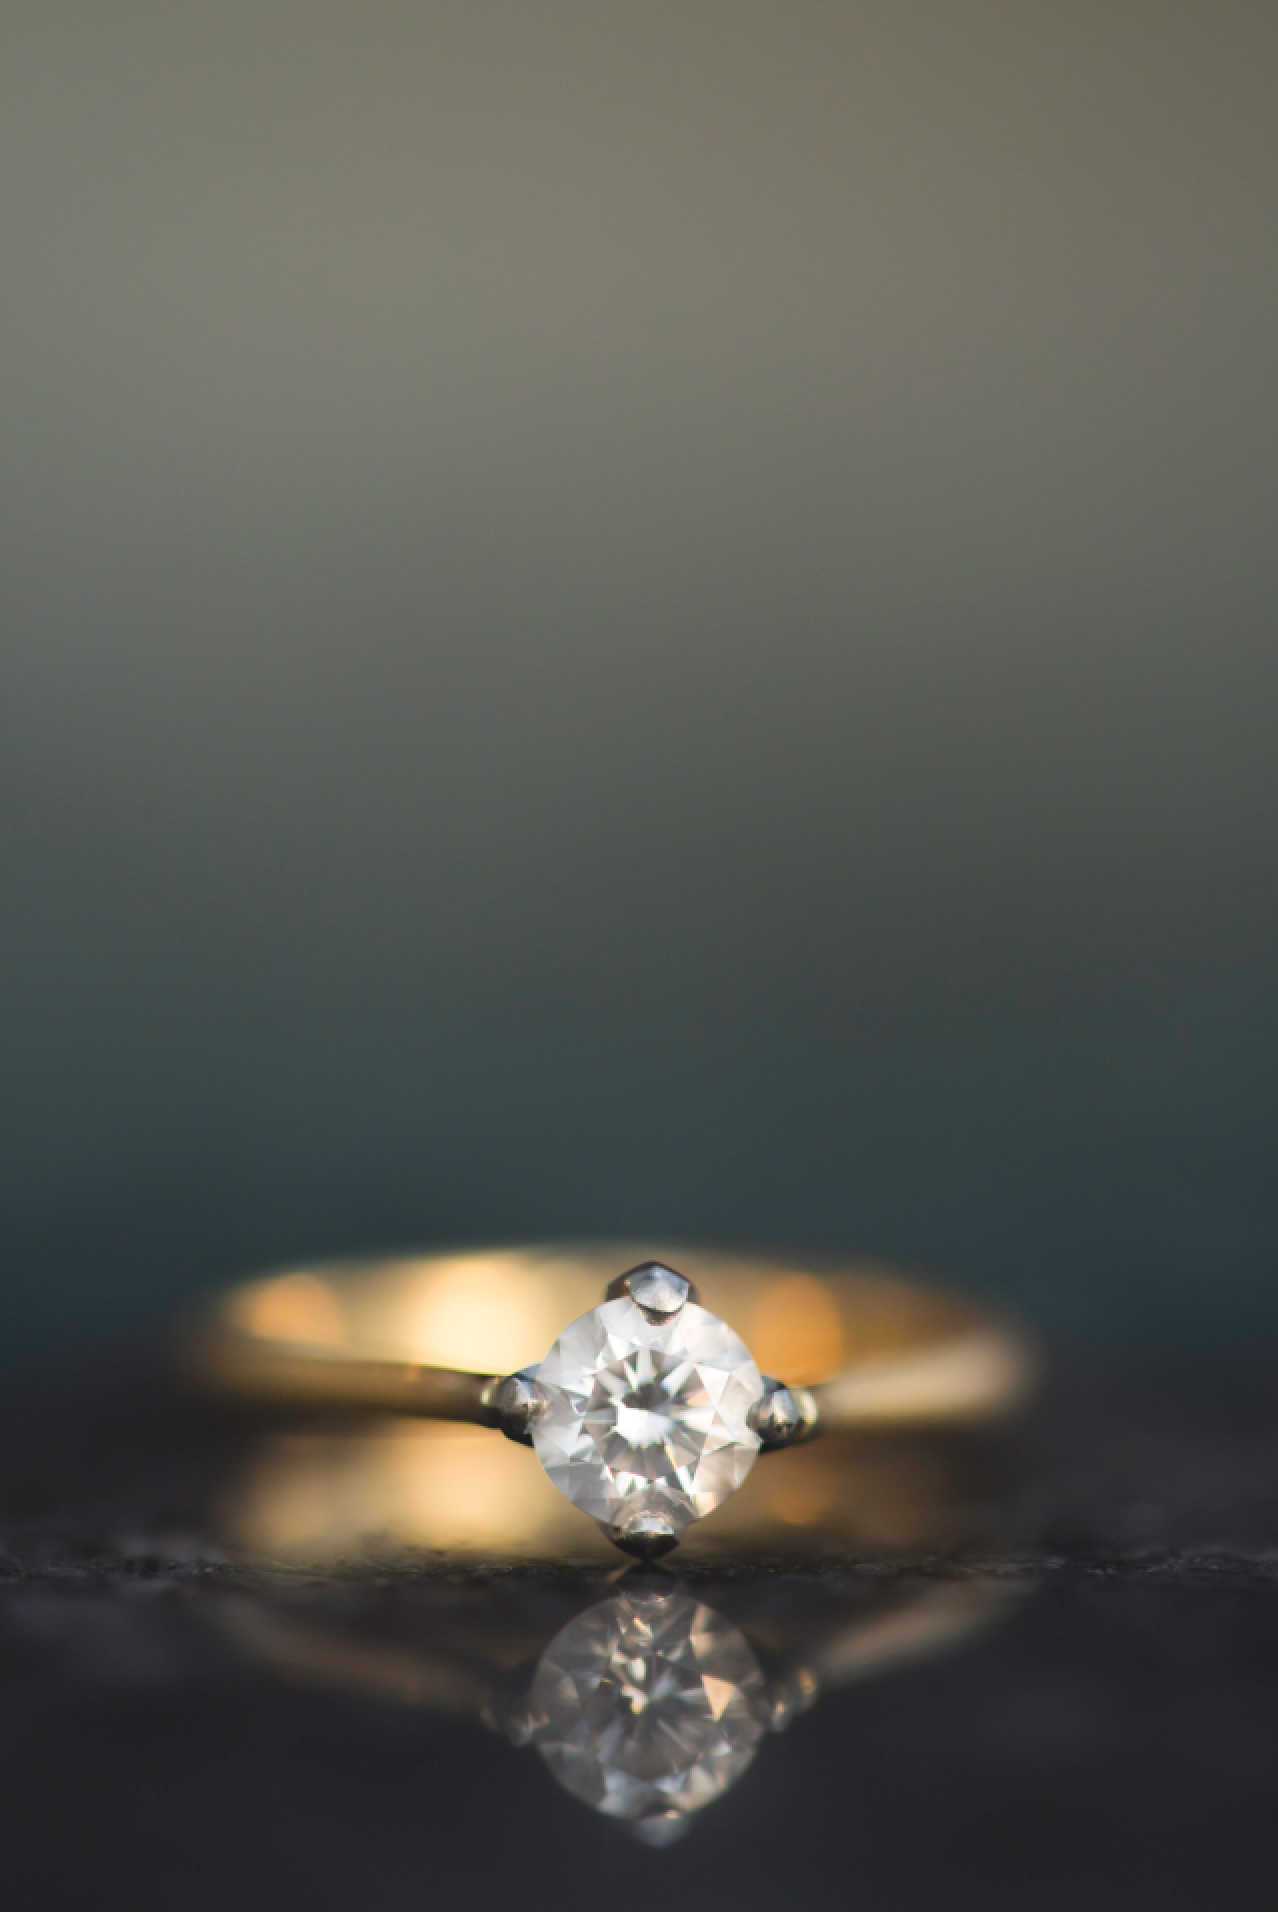 Engagement-Photos-Toronto-Corktown-Photographer-Wedding-Hamilton-GTA-Niagara-Oakville-Modern-Moments-by-Lauren-Engaged-Image-Photo22.png